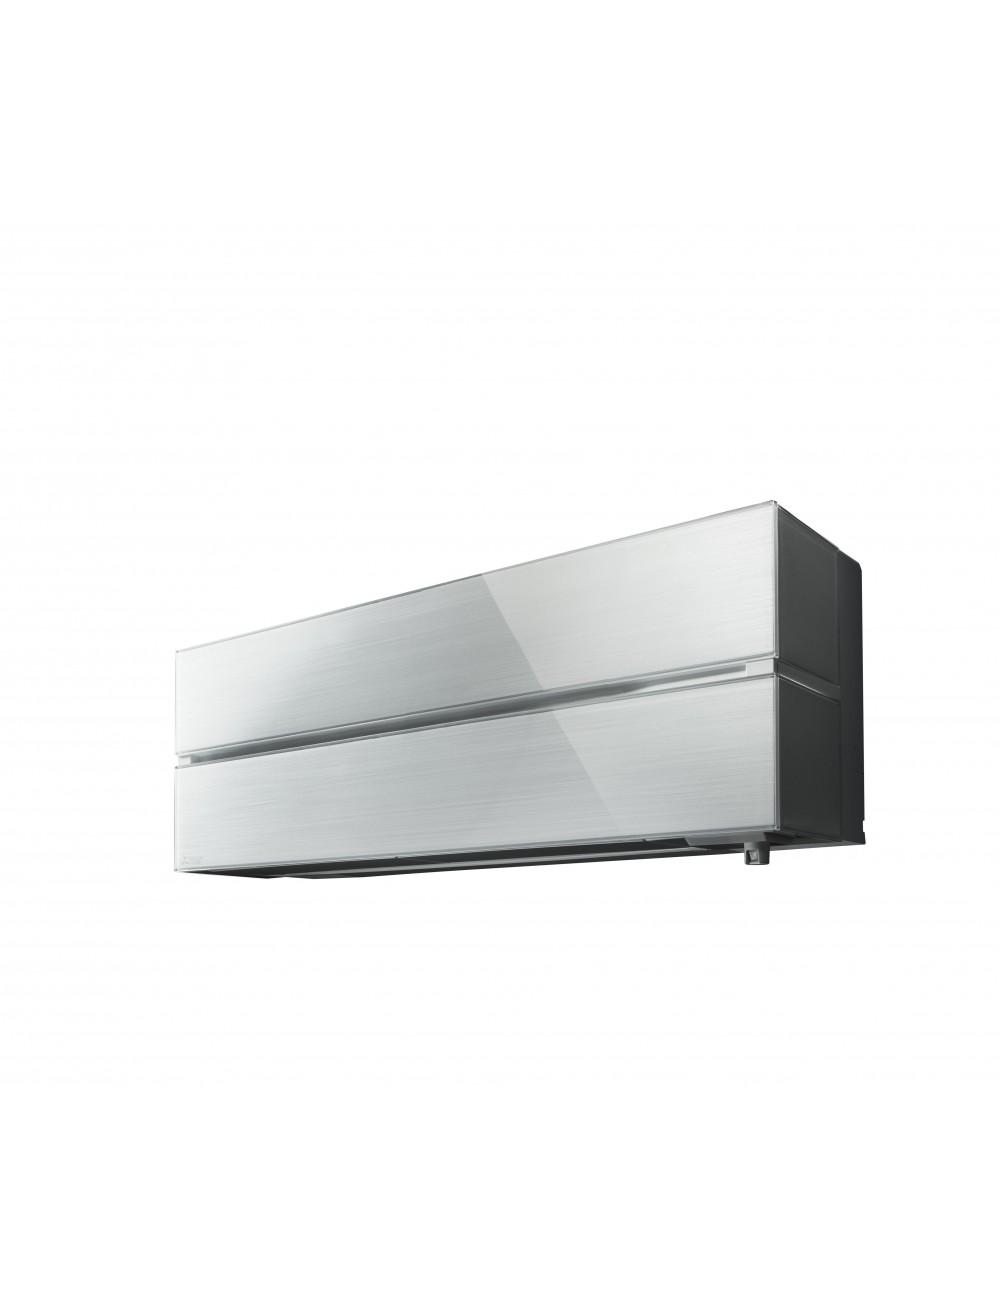 Aer conditionat Mitsubishi Electric inverter monosplit 12000 BTU Alb perlat - Kirigamine Style